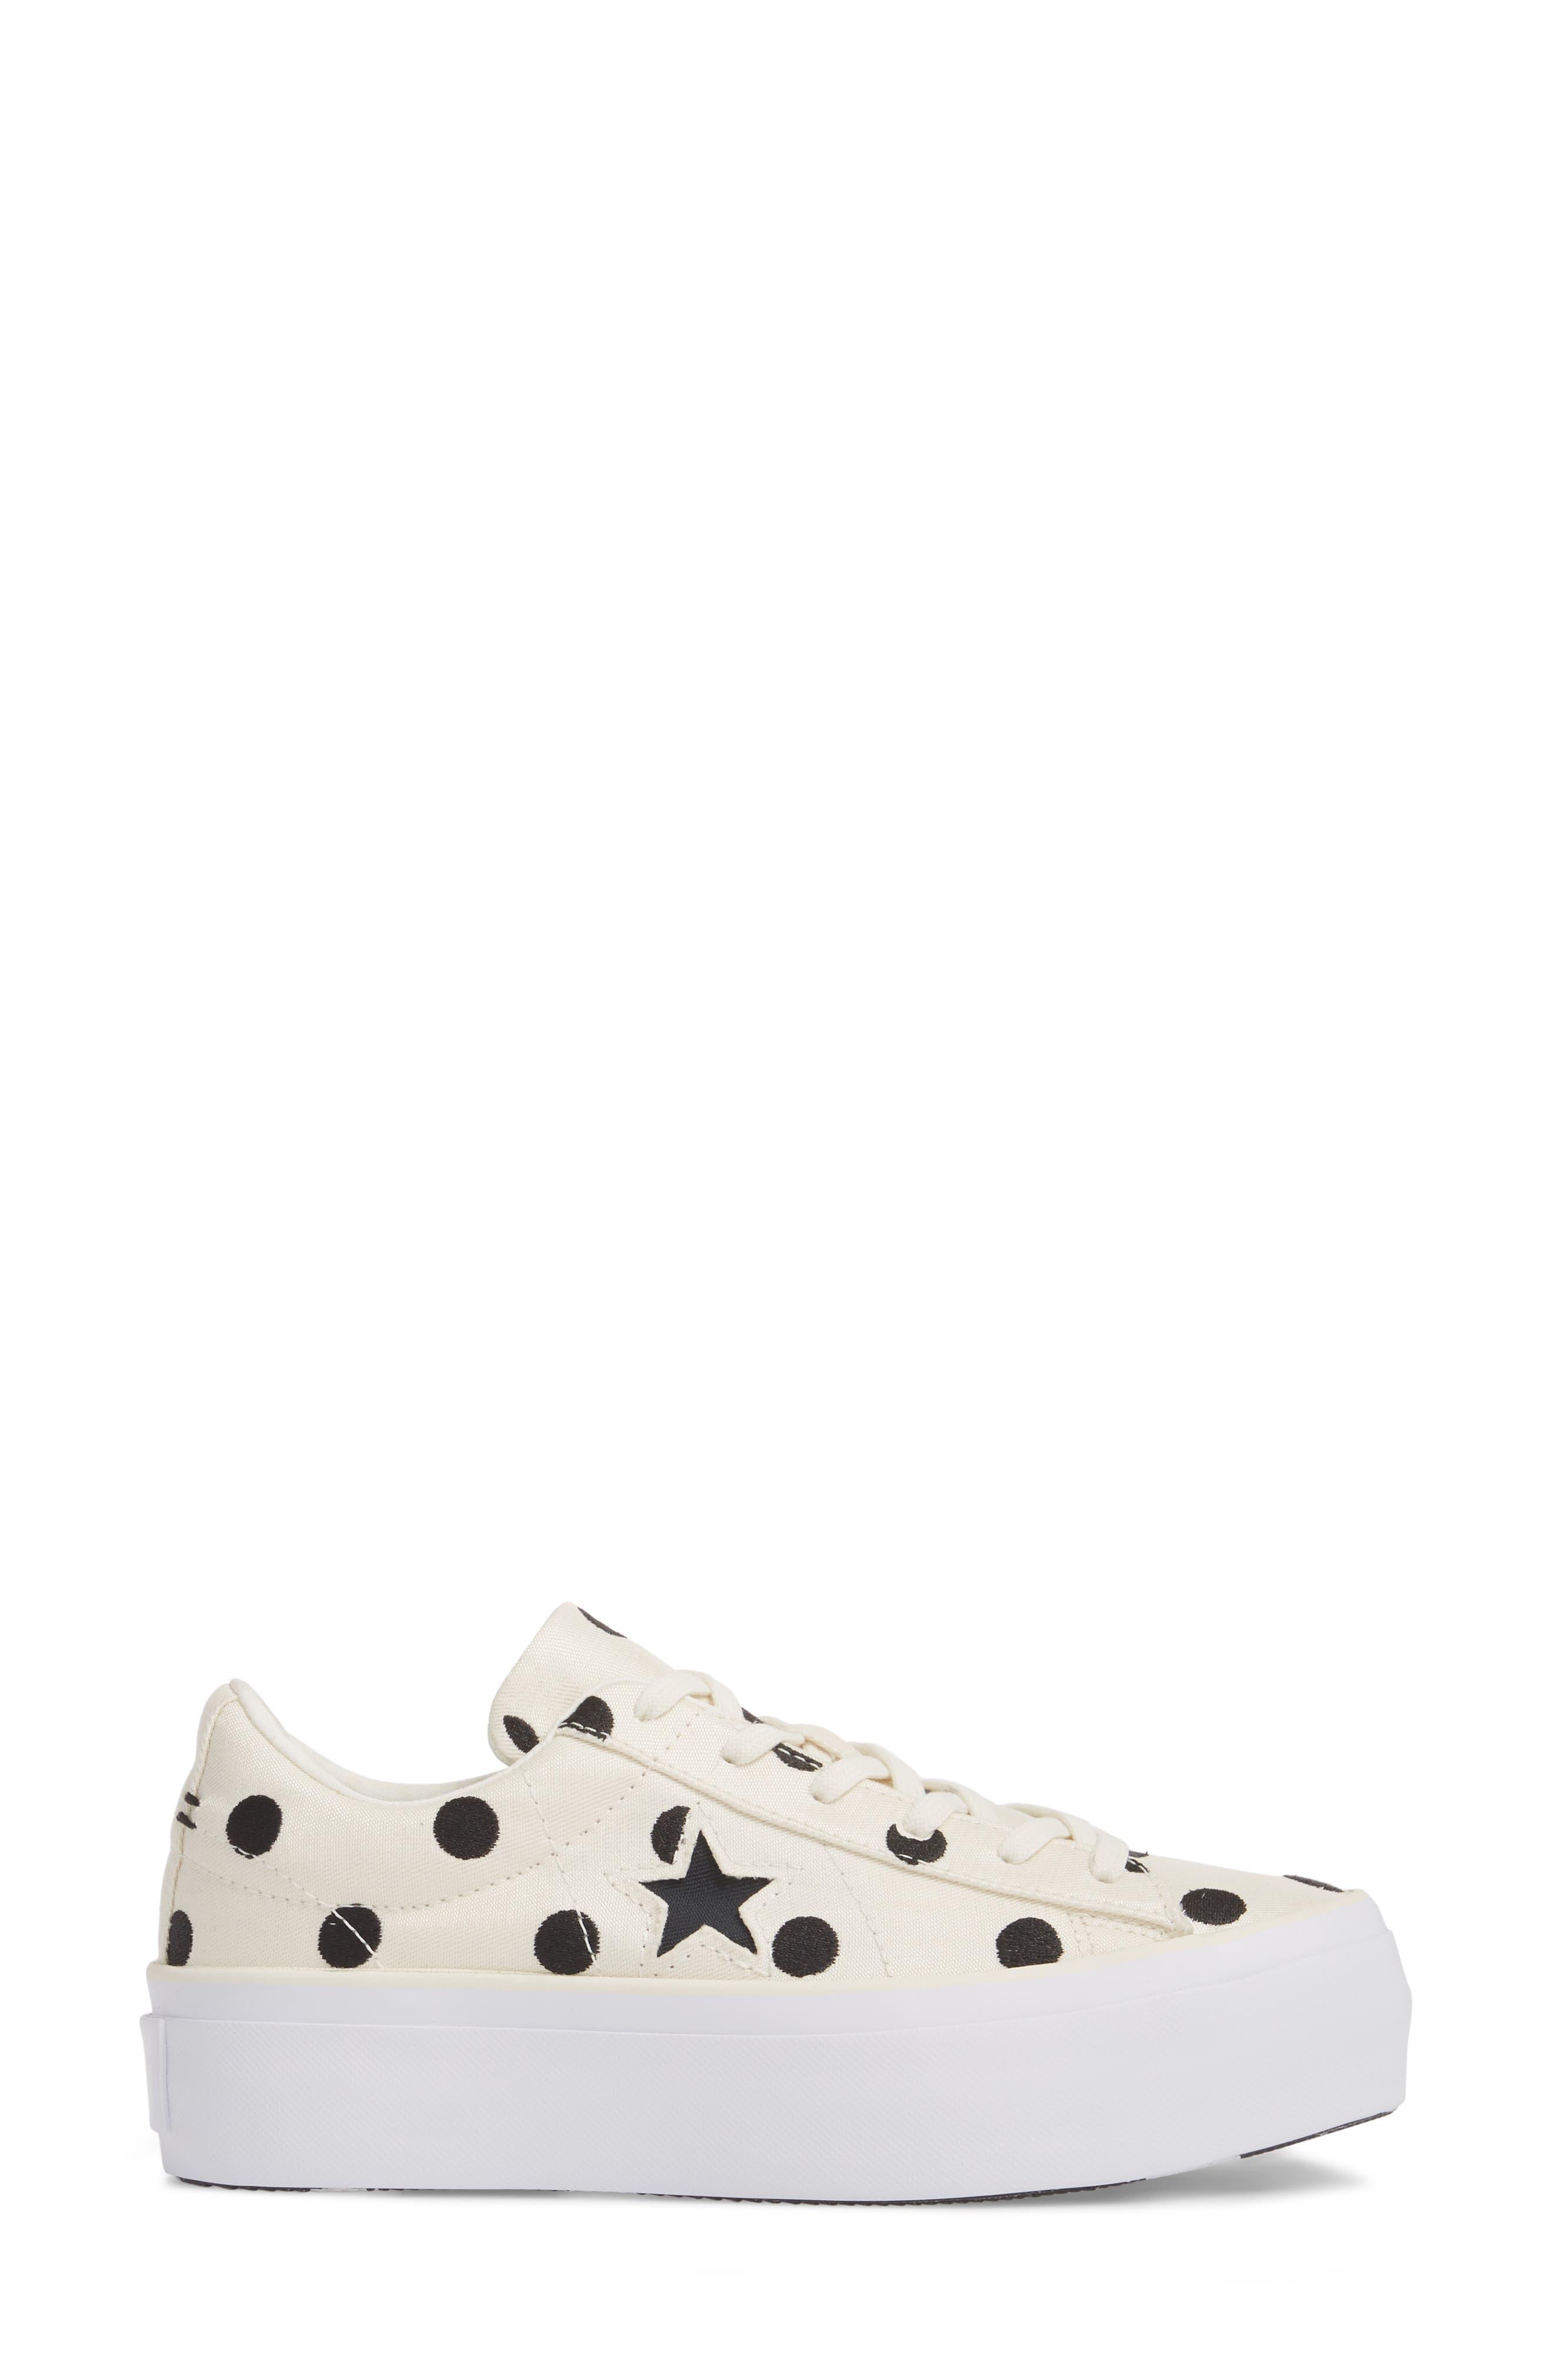 Chuck Taylor<sup>®</sup> One Star Platform Sneaker,                             Alternate thumbnail 3, color,                             Egret/ Black